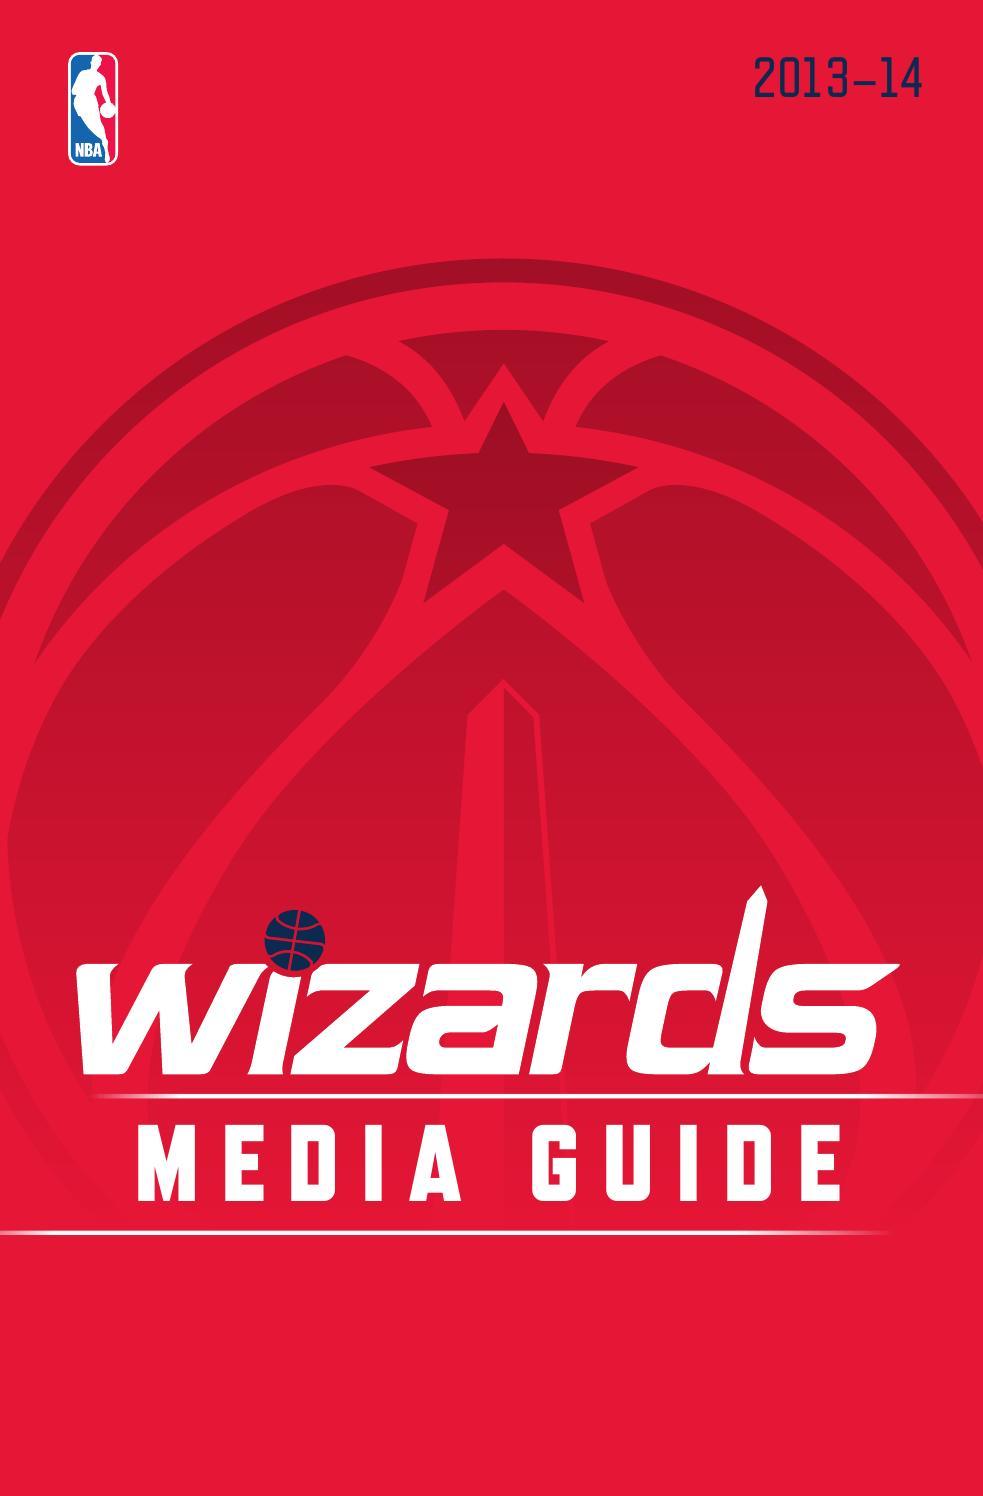 Wizards Media Guide 13 14 by Jacob Raim issuu